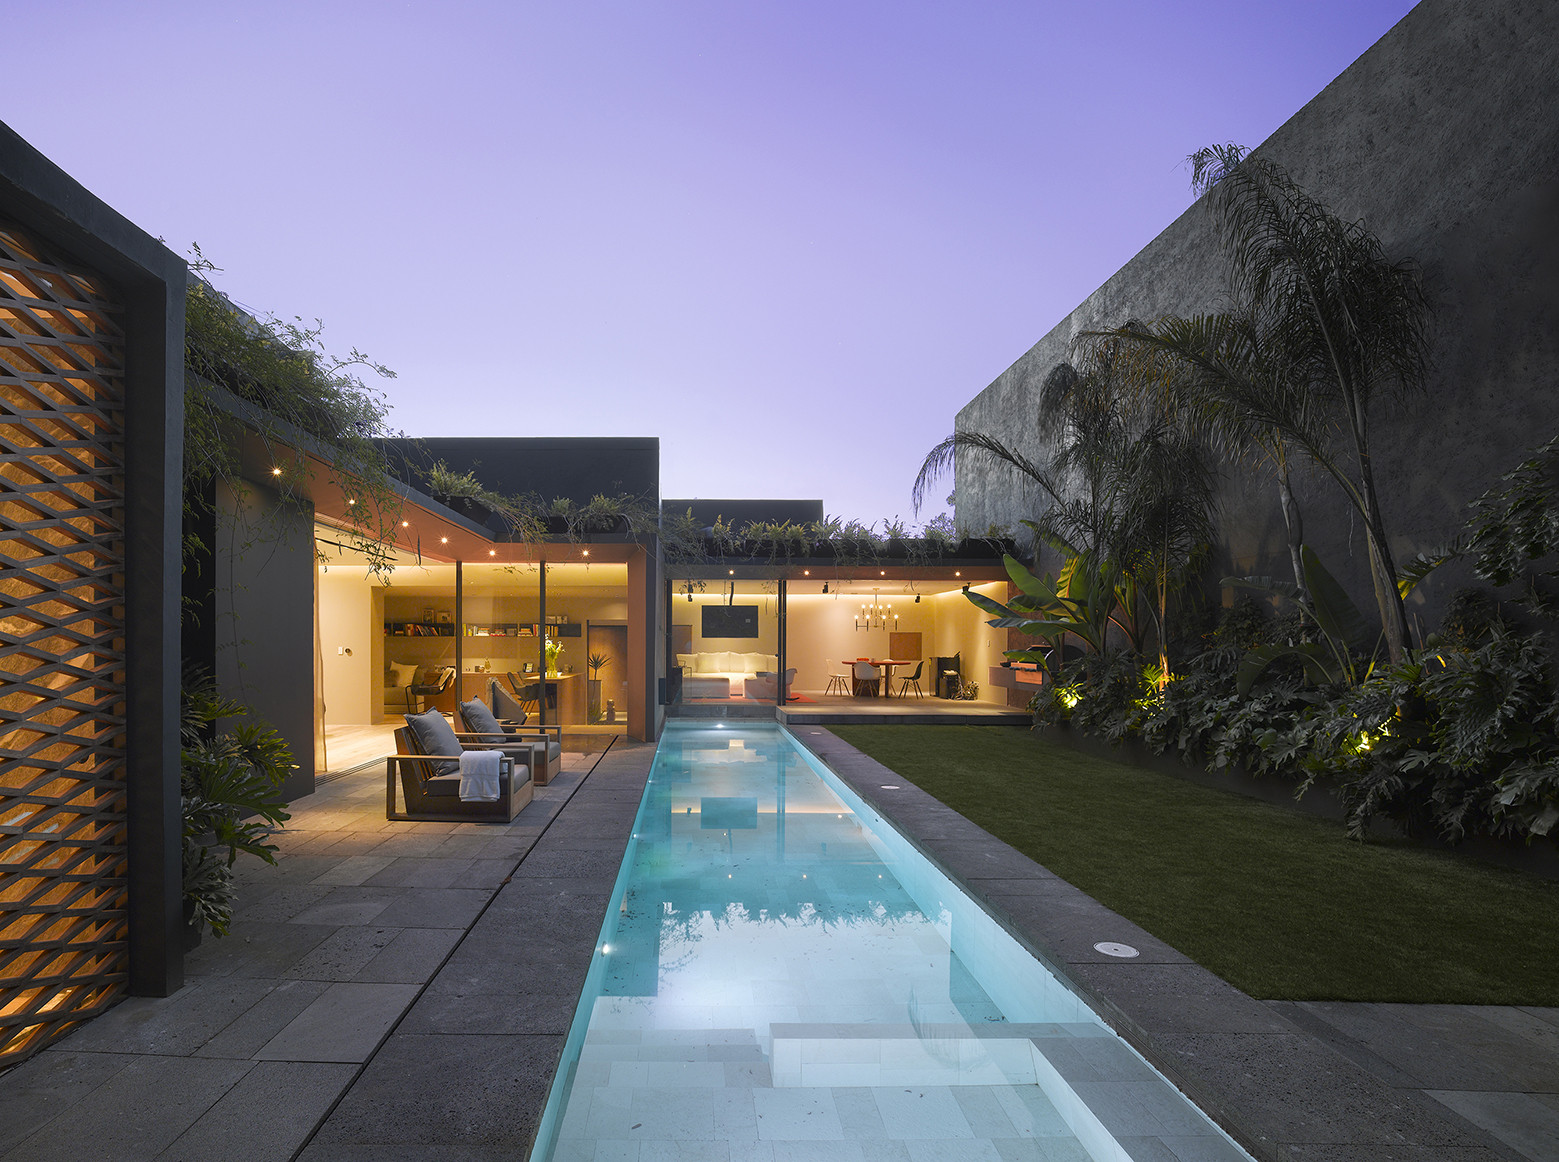 The Barrancas House EZEQUIELFARCA arquitectura y diseo ArchDaily